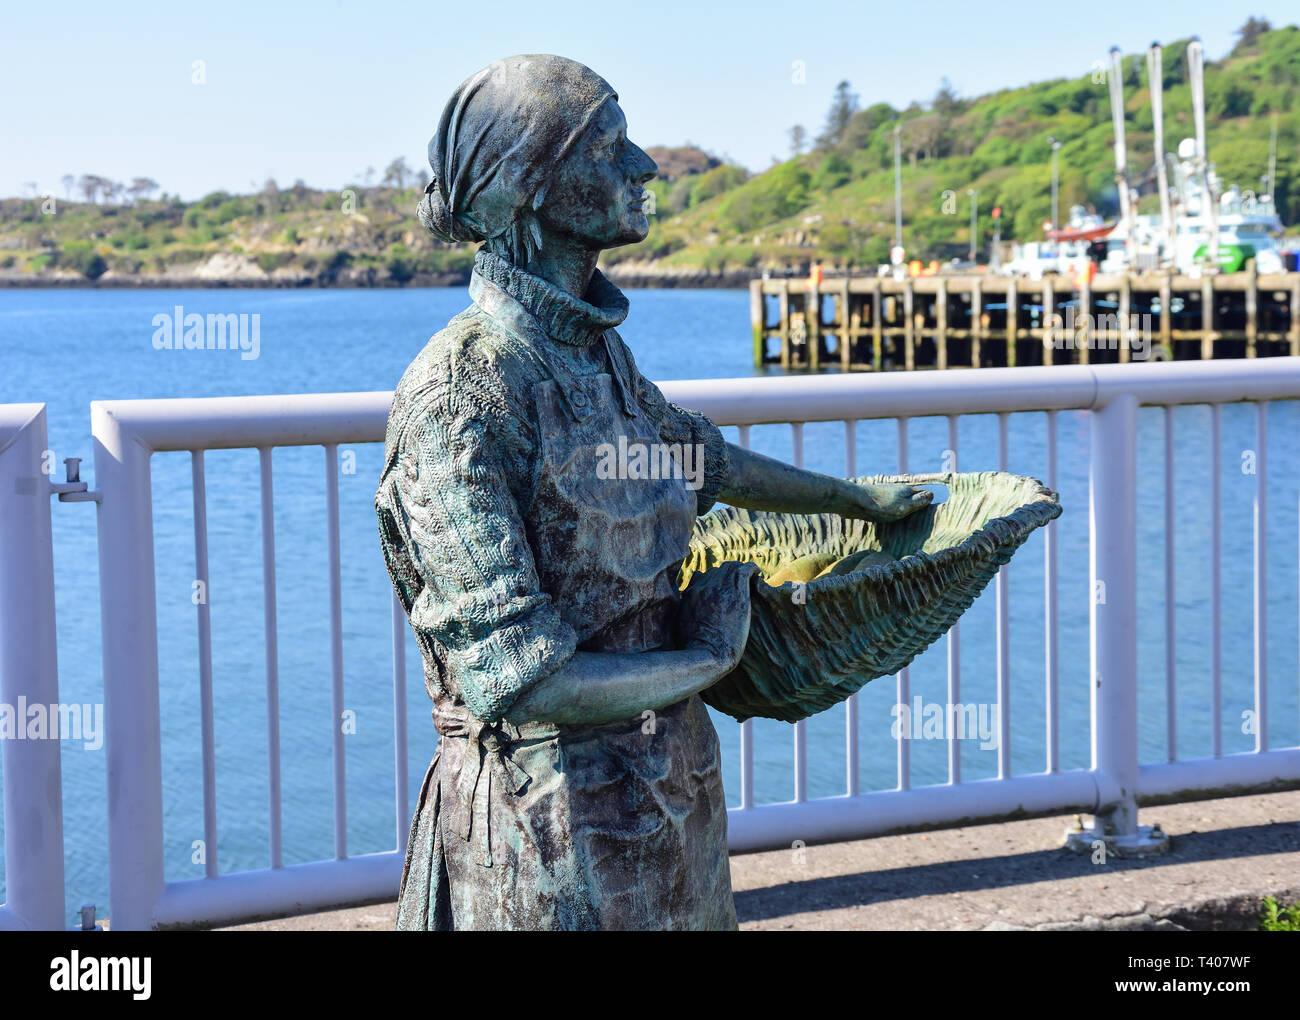 'Stornoway Herring Girl' statue on seafront, Stornoway, Isle of Lewis, Outer Hebrides, Na h-Eileanan Siar, Scotland, United Kingdom - Stock Image